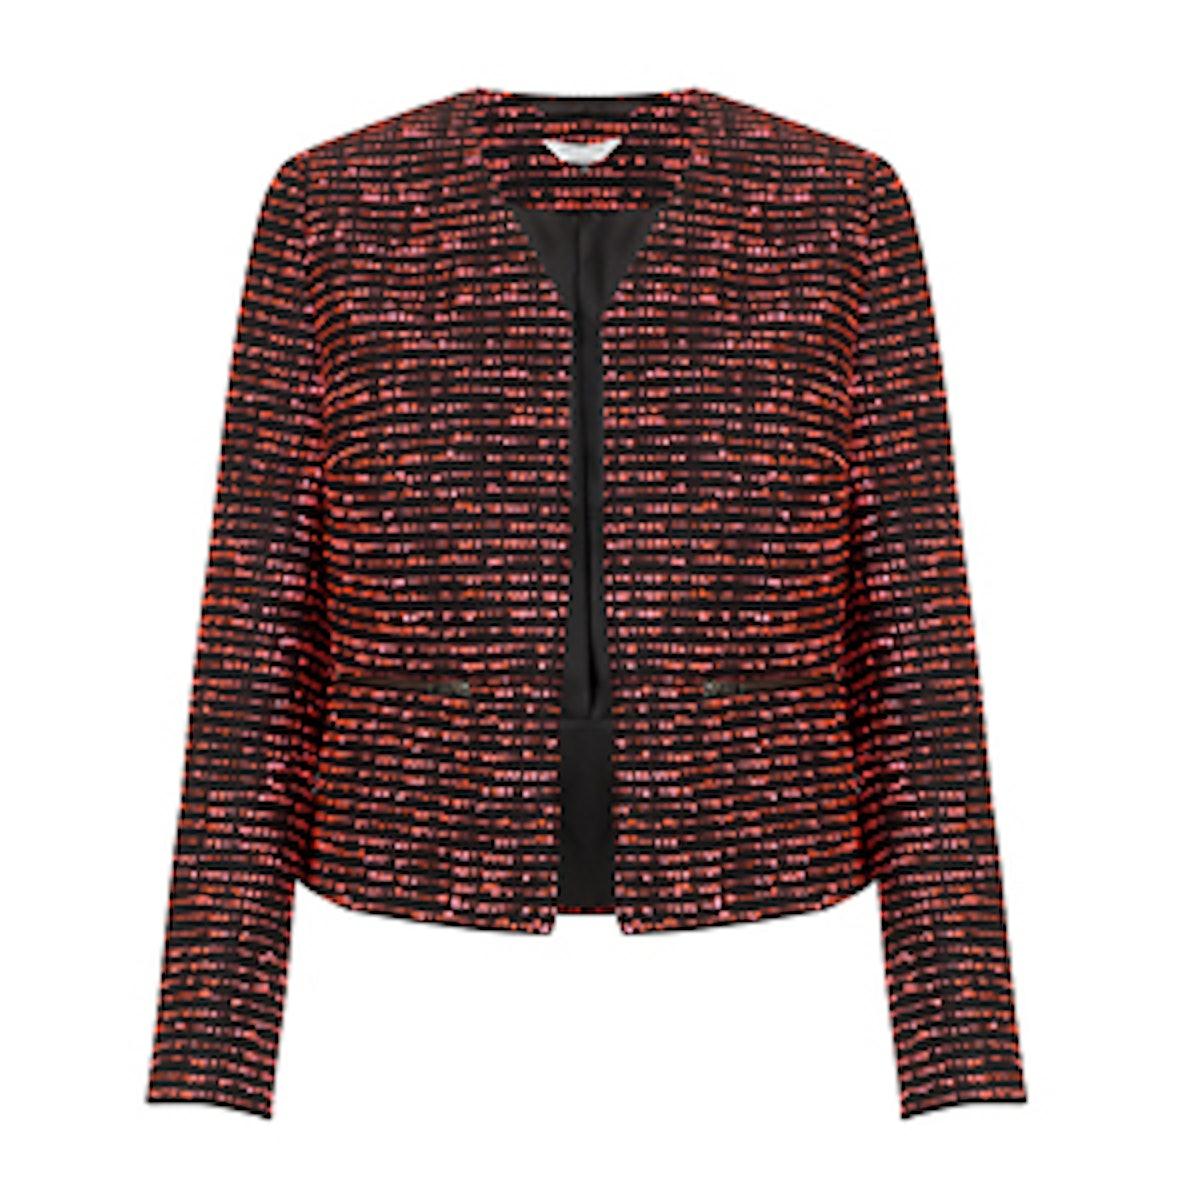 Collection Tweed Jacket